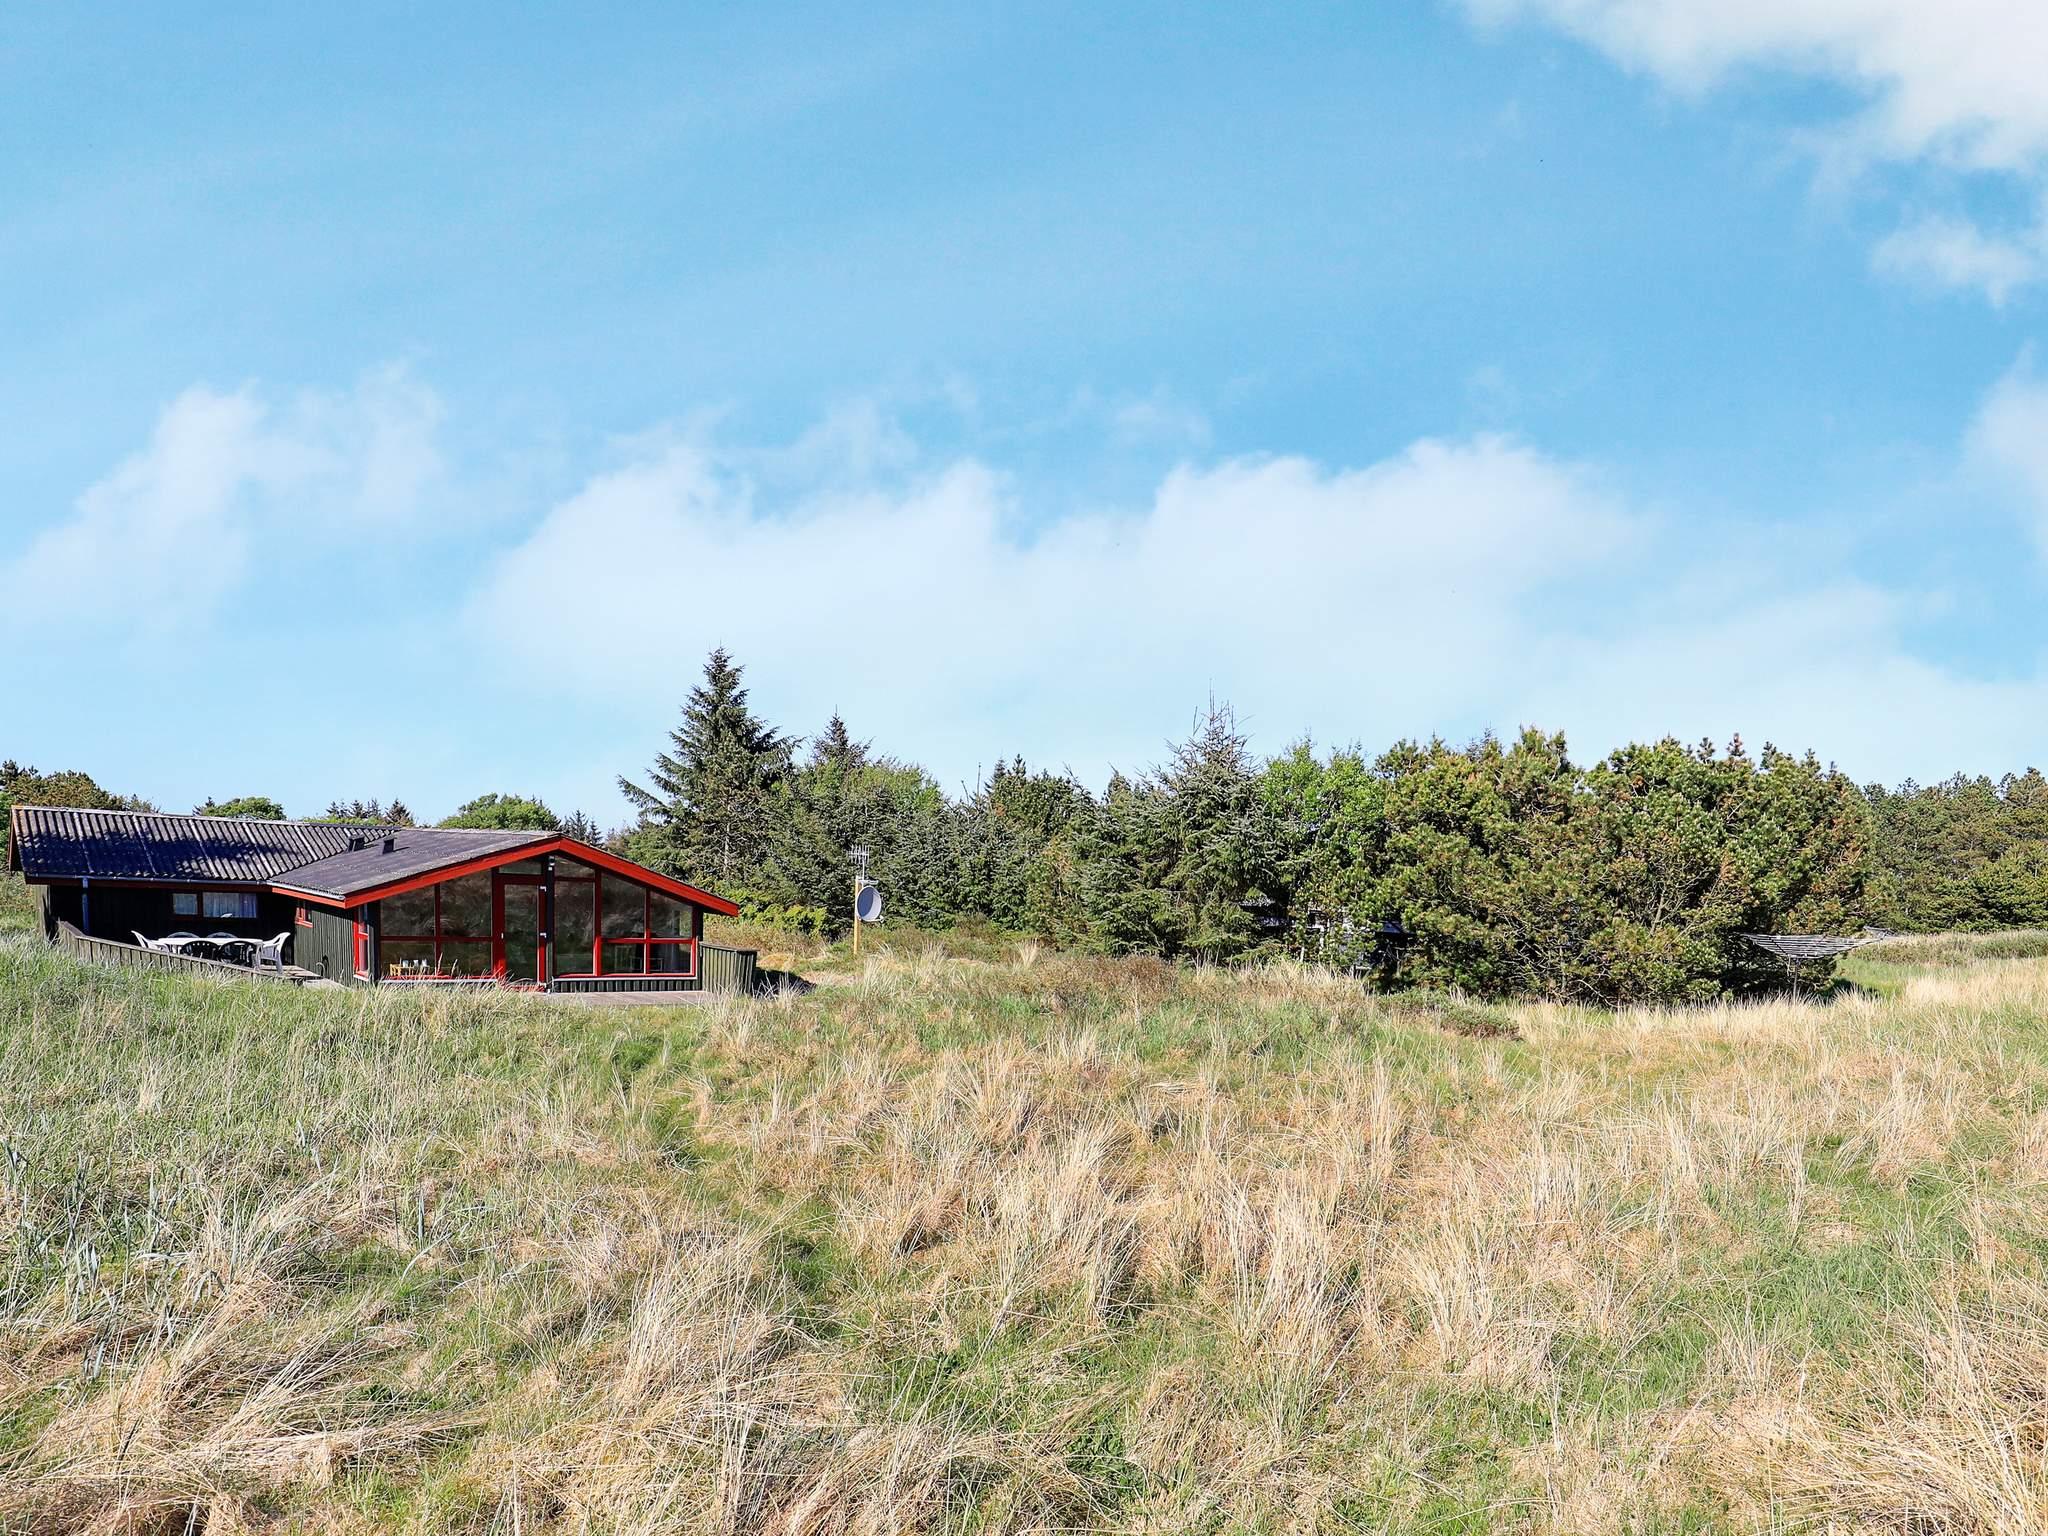 Ferienhaus Kjul Strand (319409), Hirtshals, , Dänische Nordsee, Dänemark, Bild 17